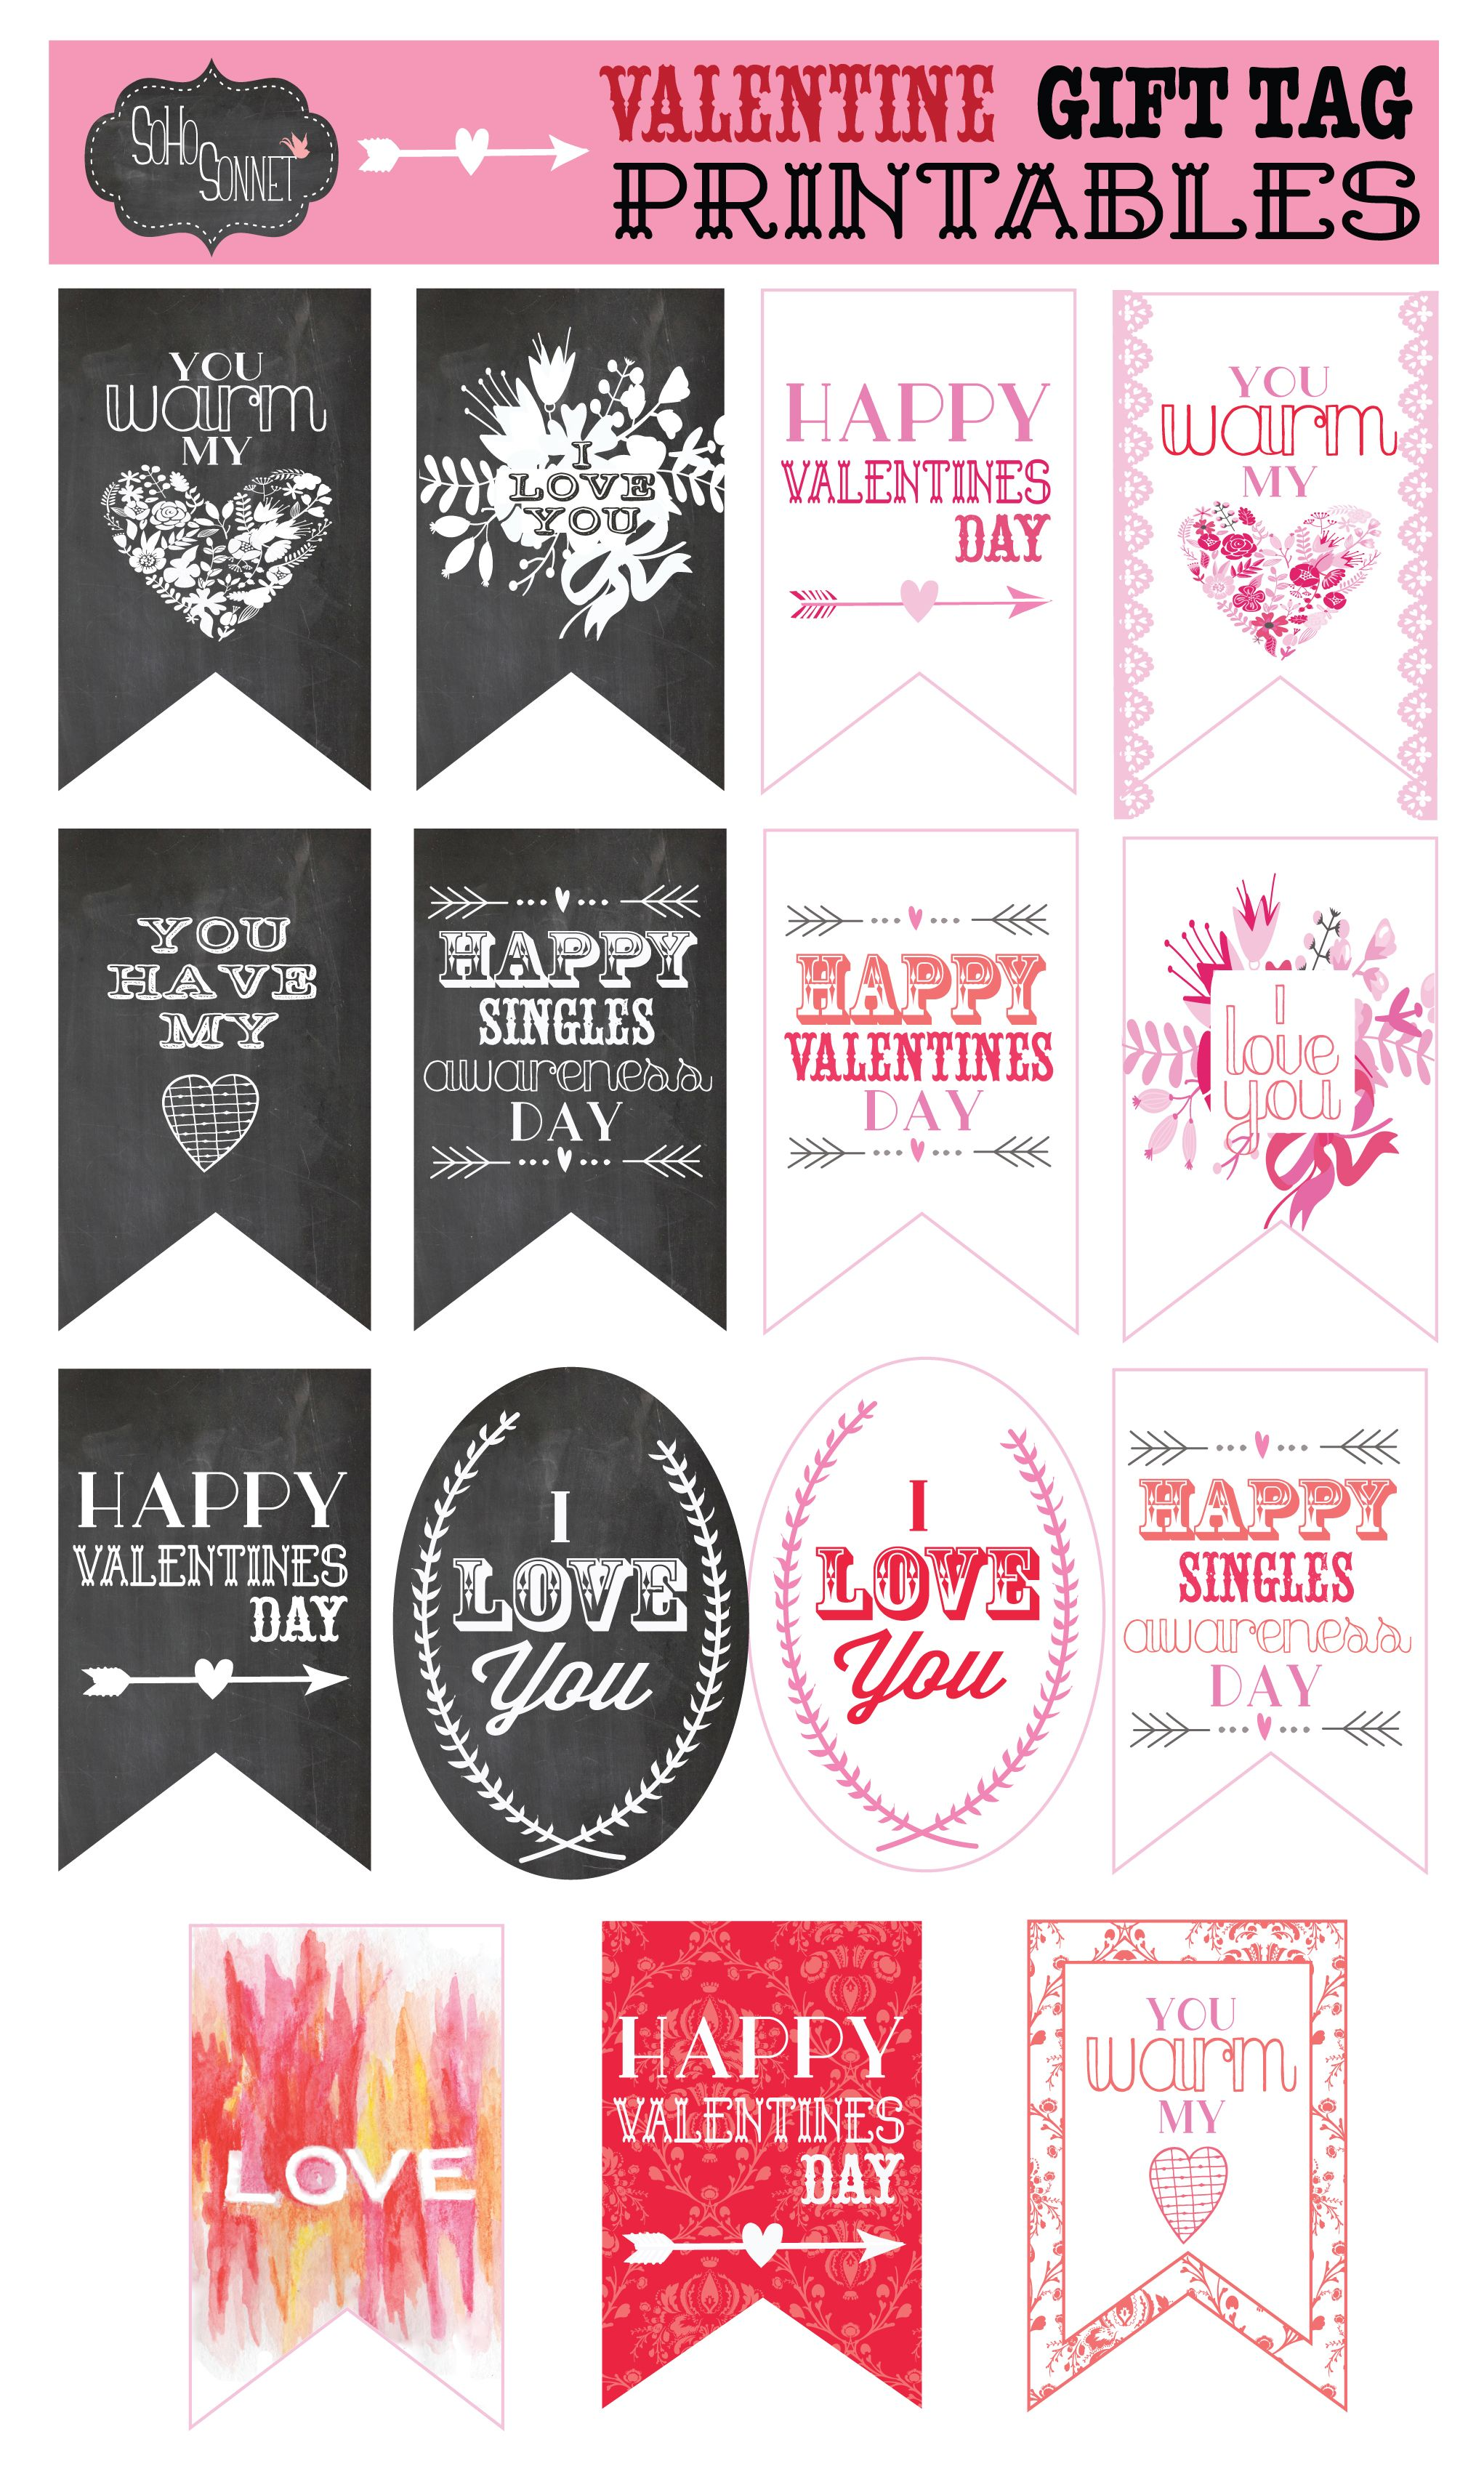 e8332e9d4d04 Free Valentine Gift Tag Printables   Ideas for Valentine s Day ...